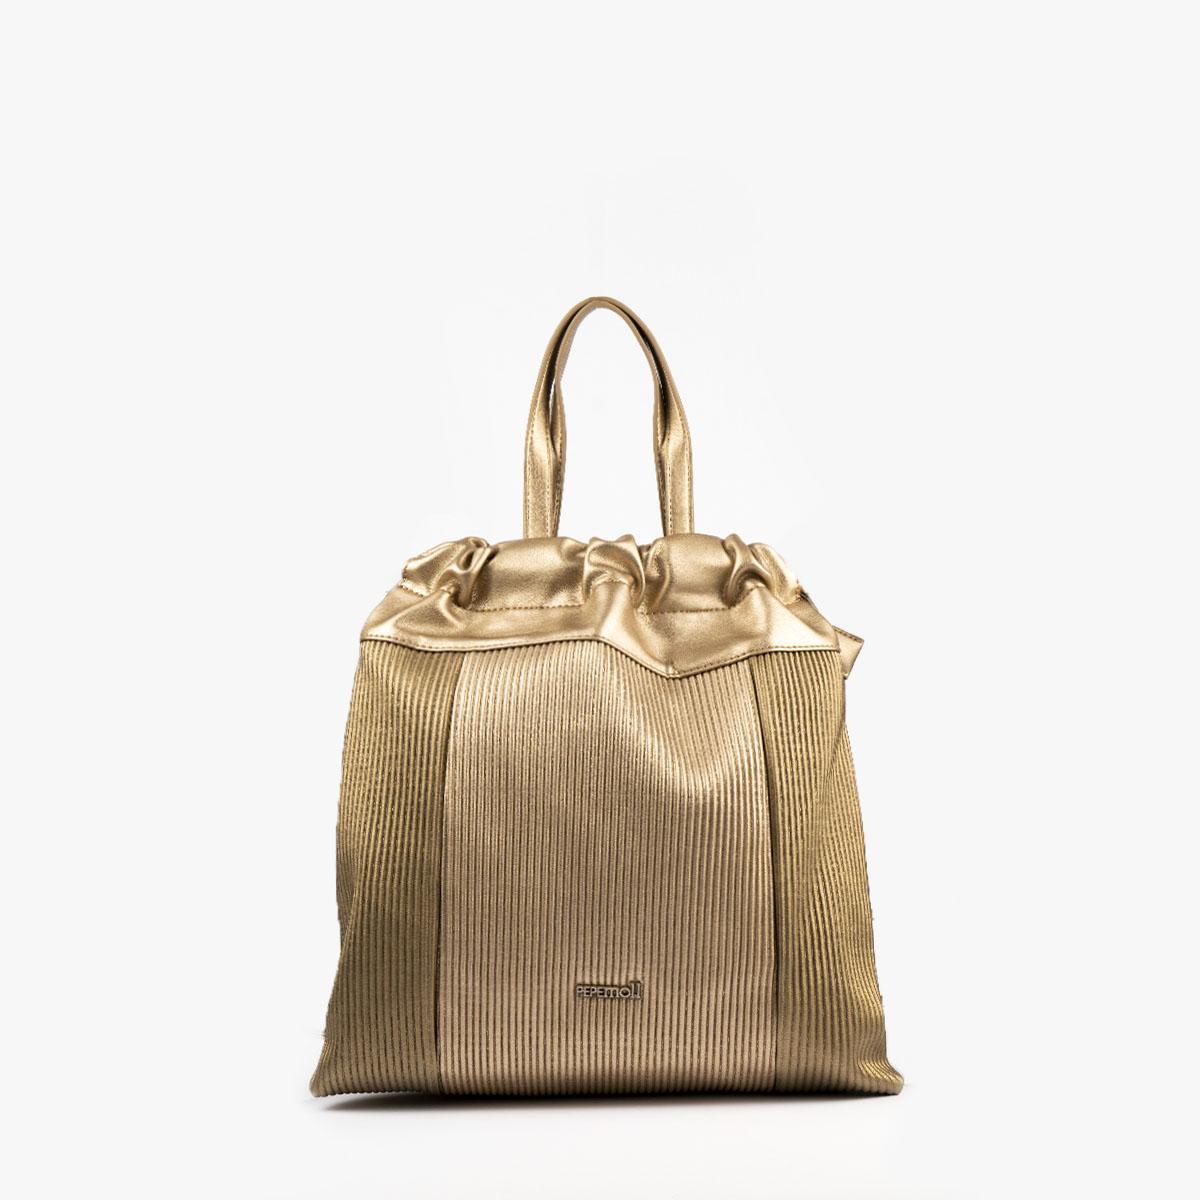 44120 bolso de mochila dorado pepemoll